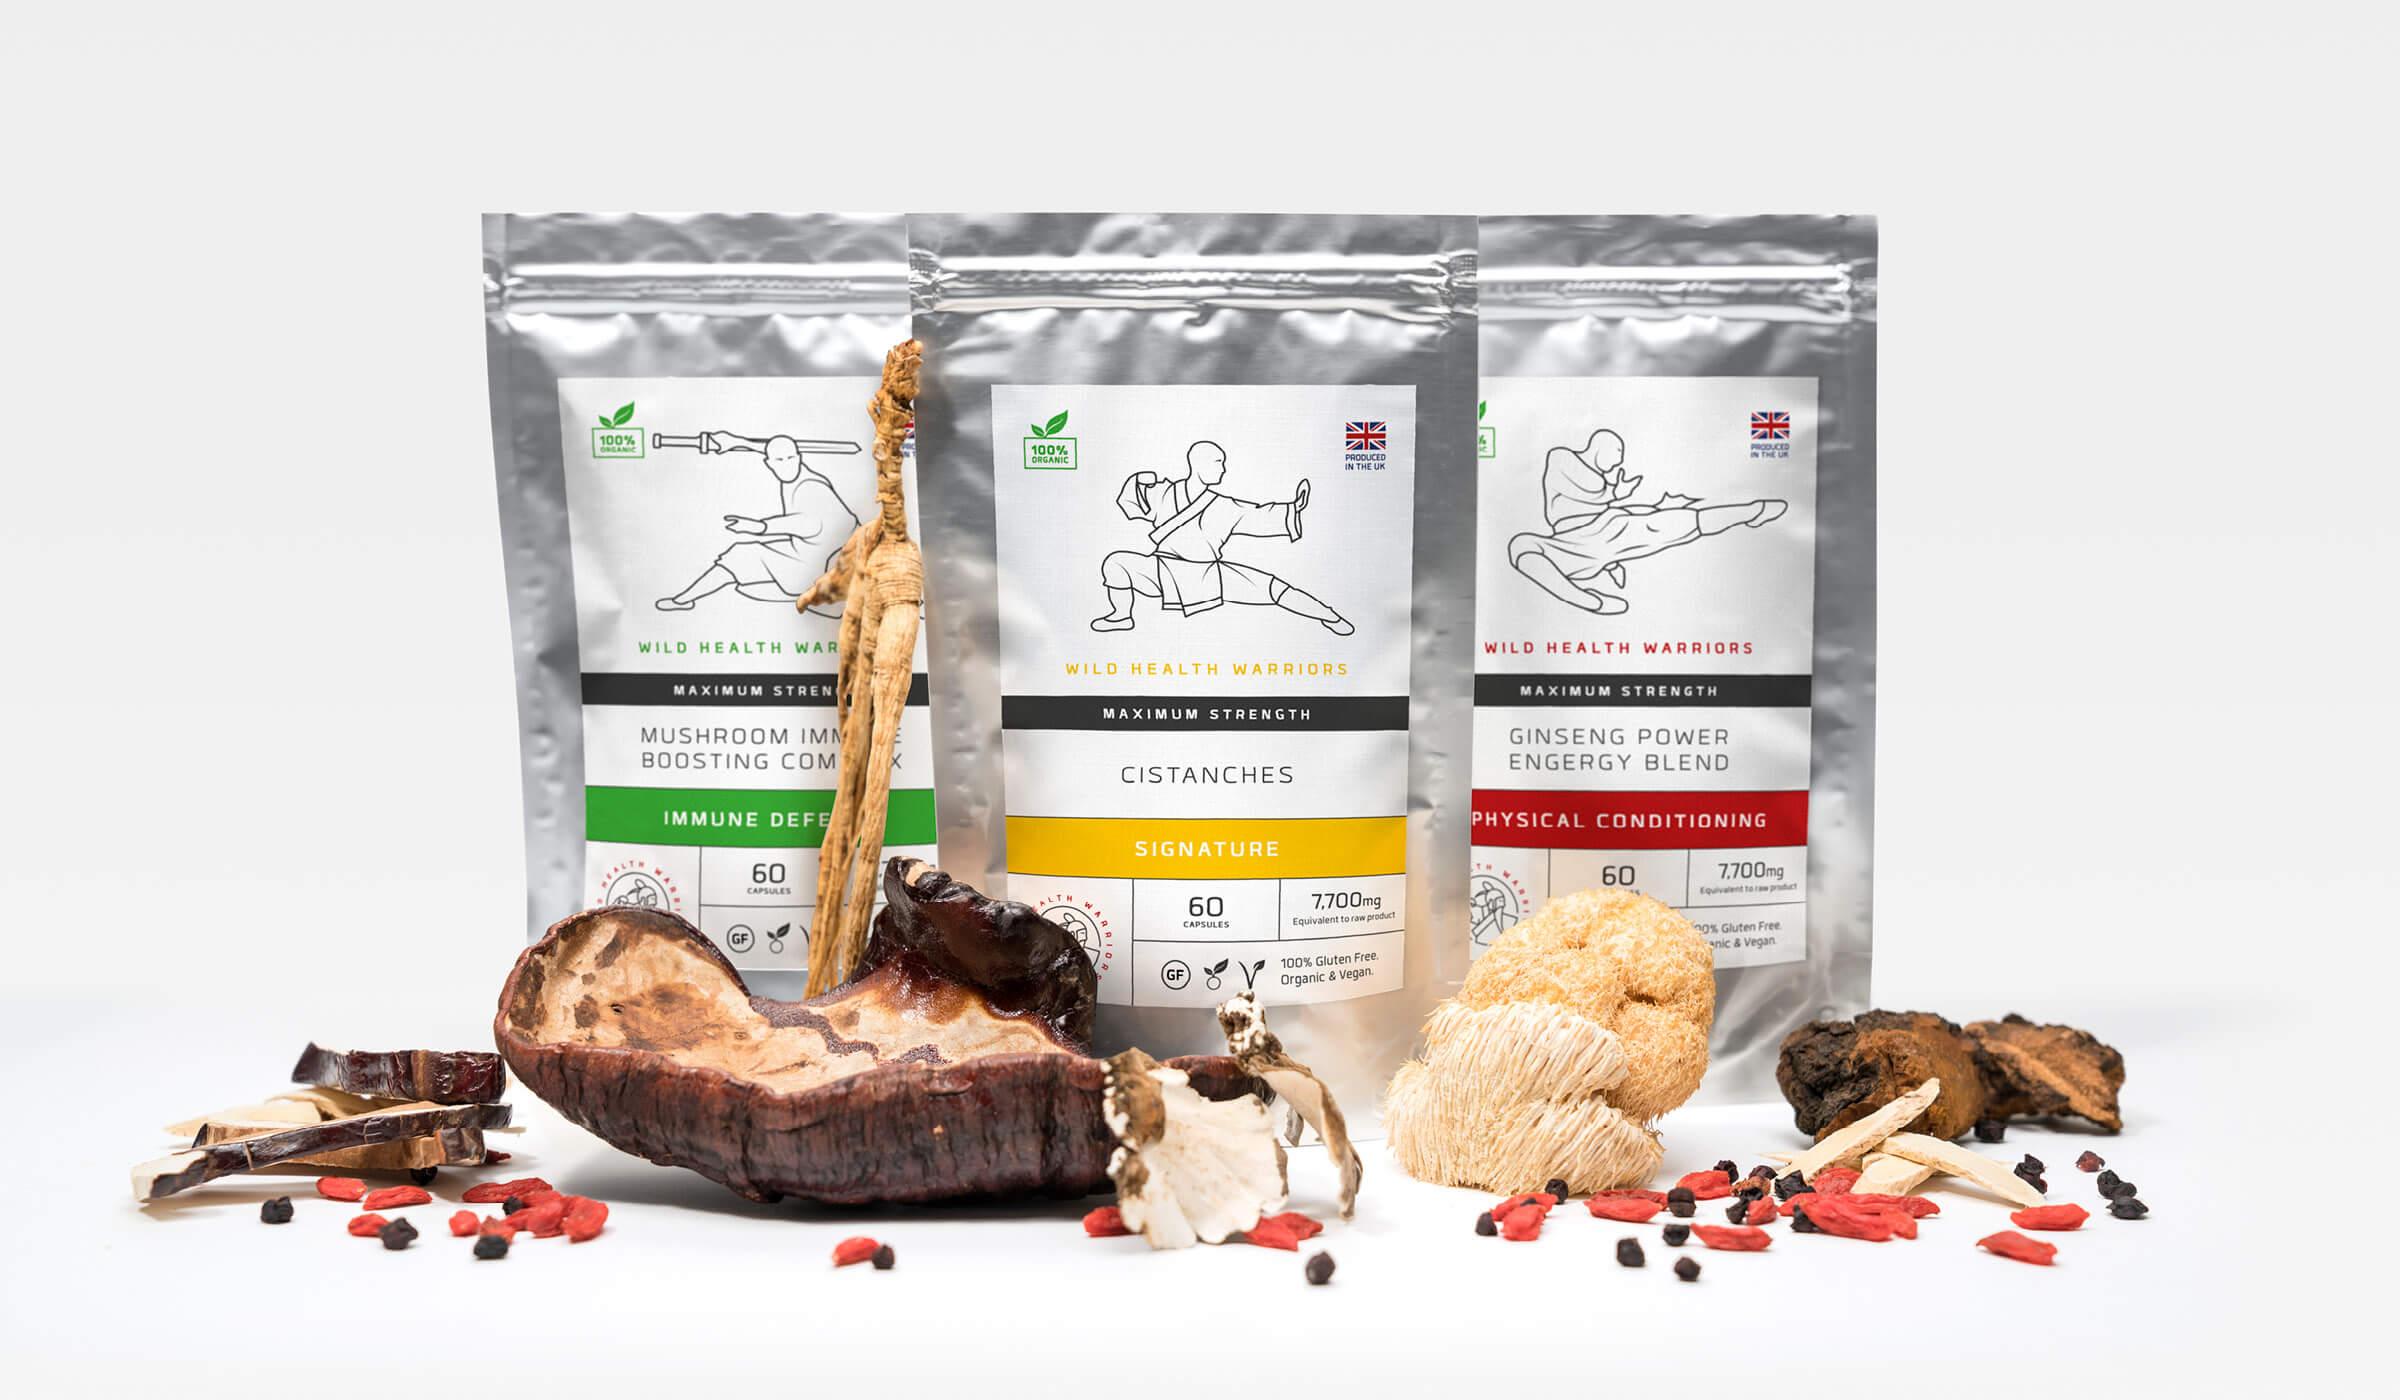 herbal health supplements packaging design